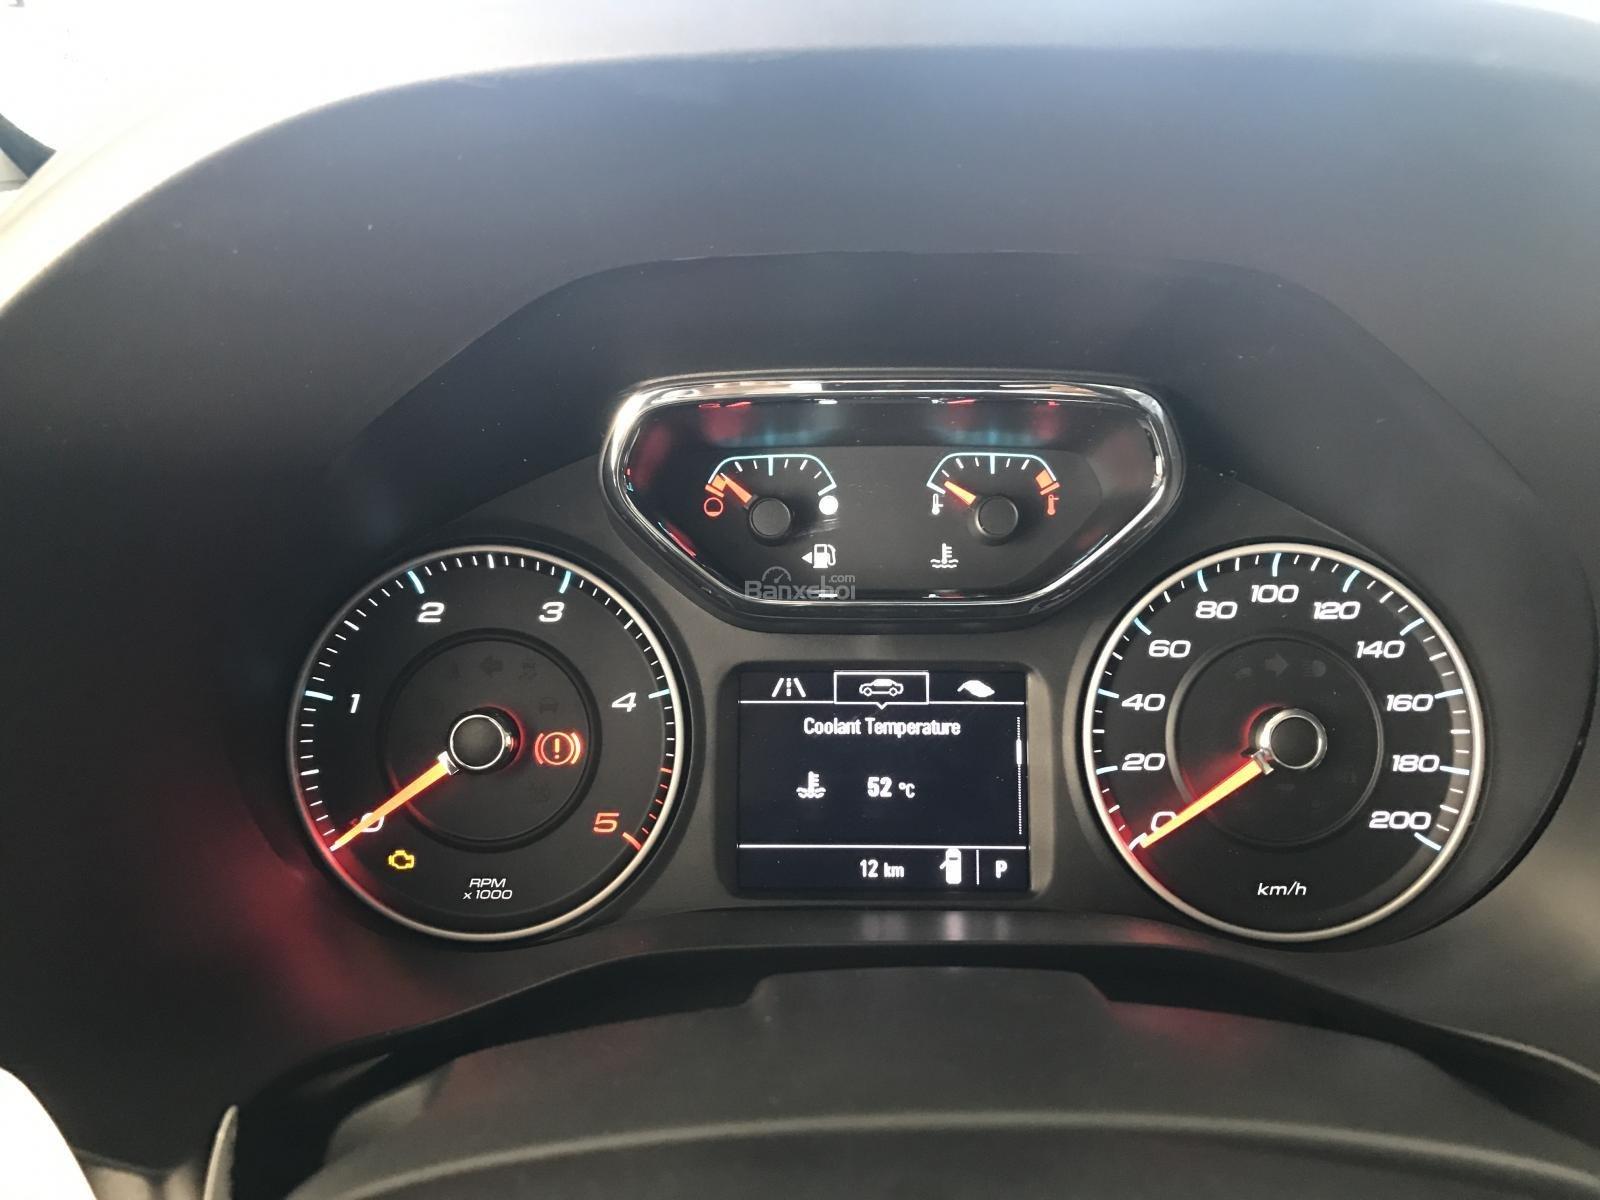 Mẫu SUV 07 chỗ Chevrolet Trailblazer 2.5L 4x2 AT 2018 (Nhập từ Thái Lan), lh 0963613200-5